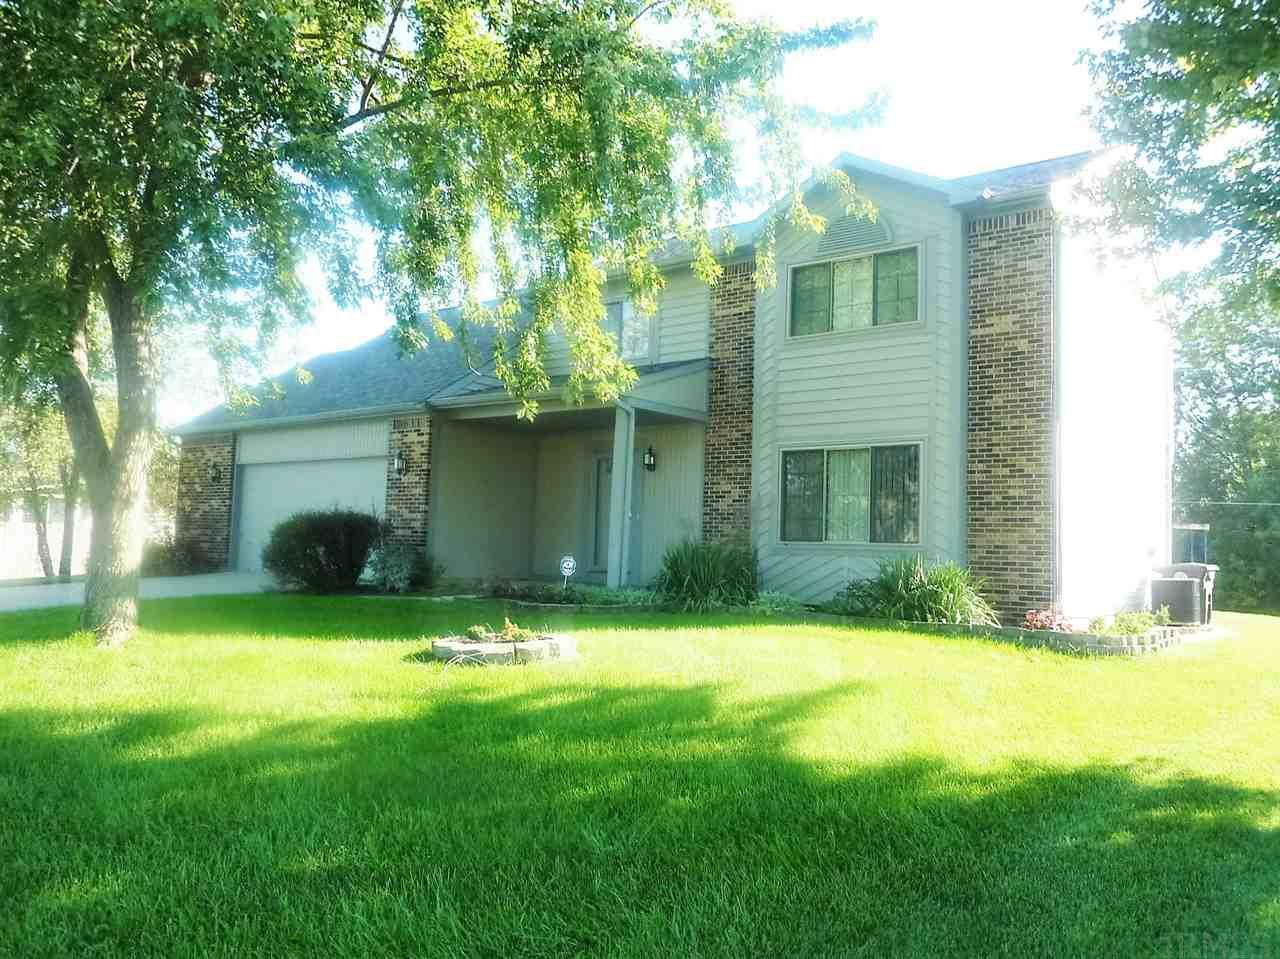 927 Yellow Lake Dr, Fort Wayne, IN 46804